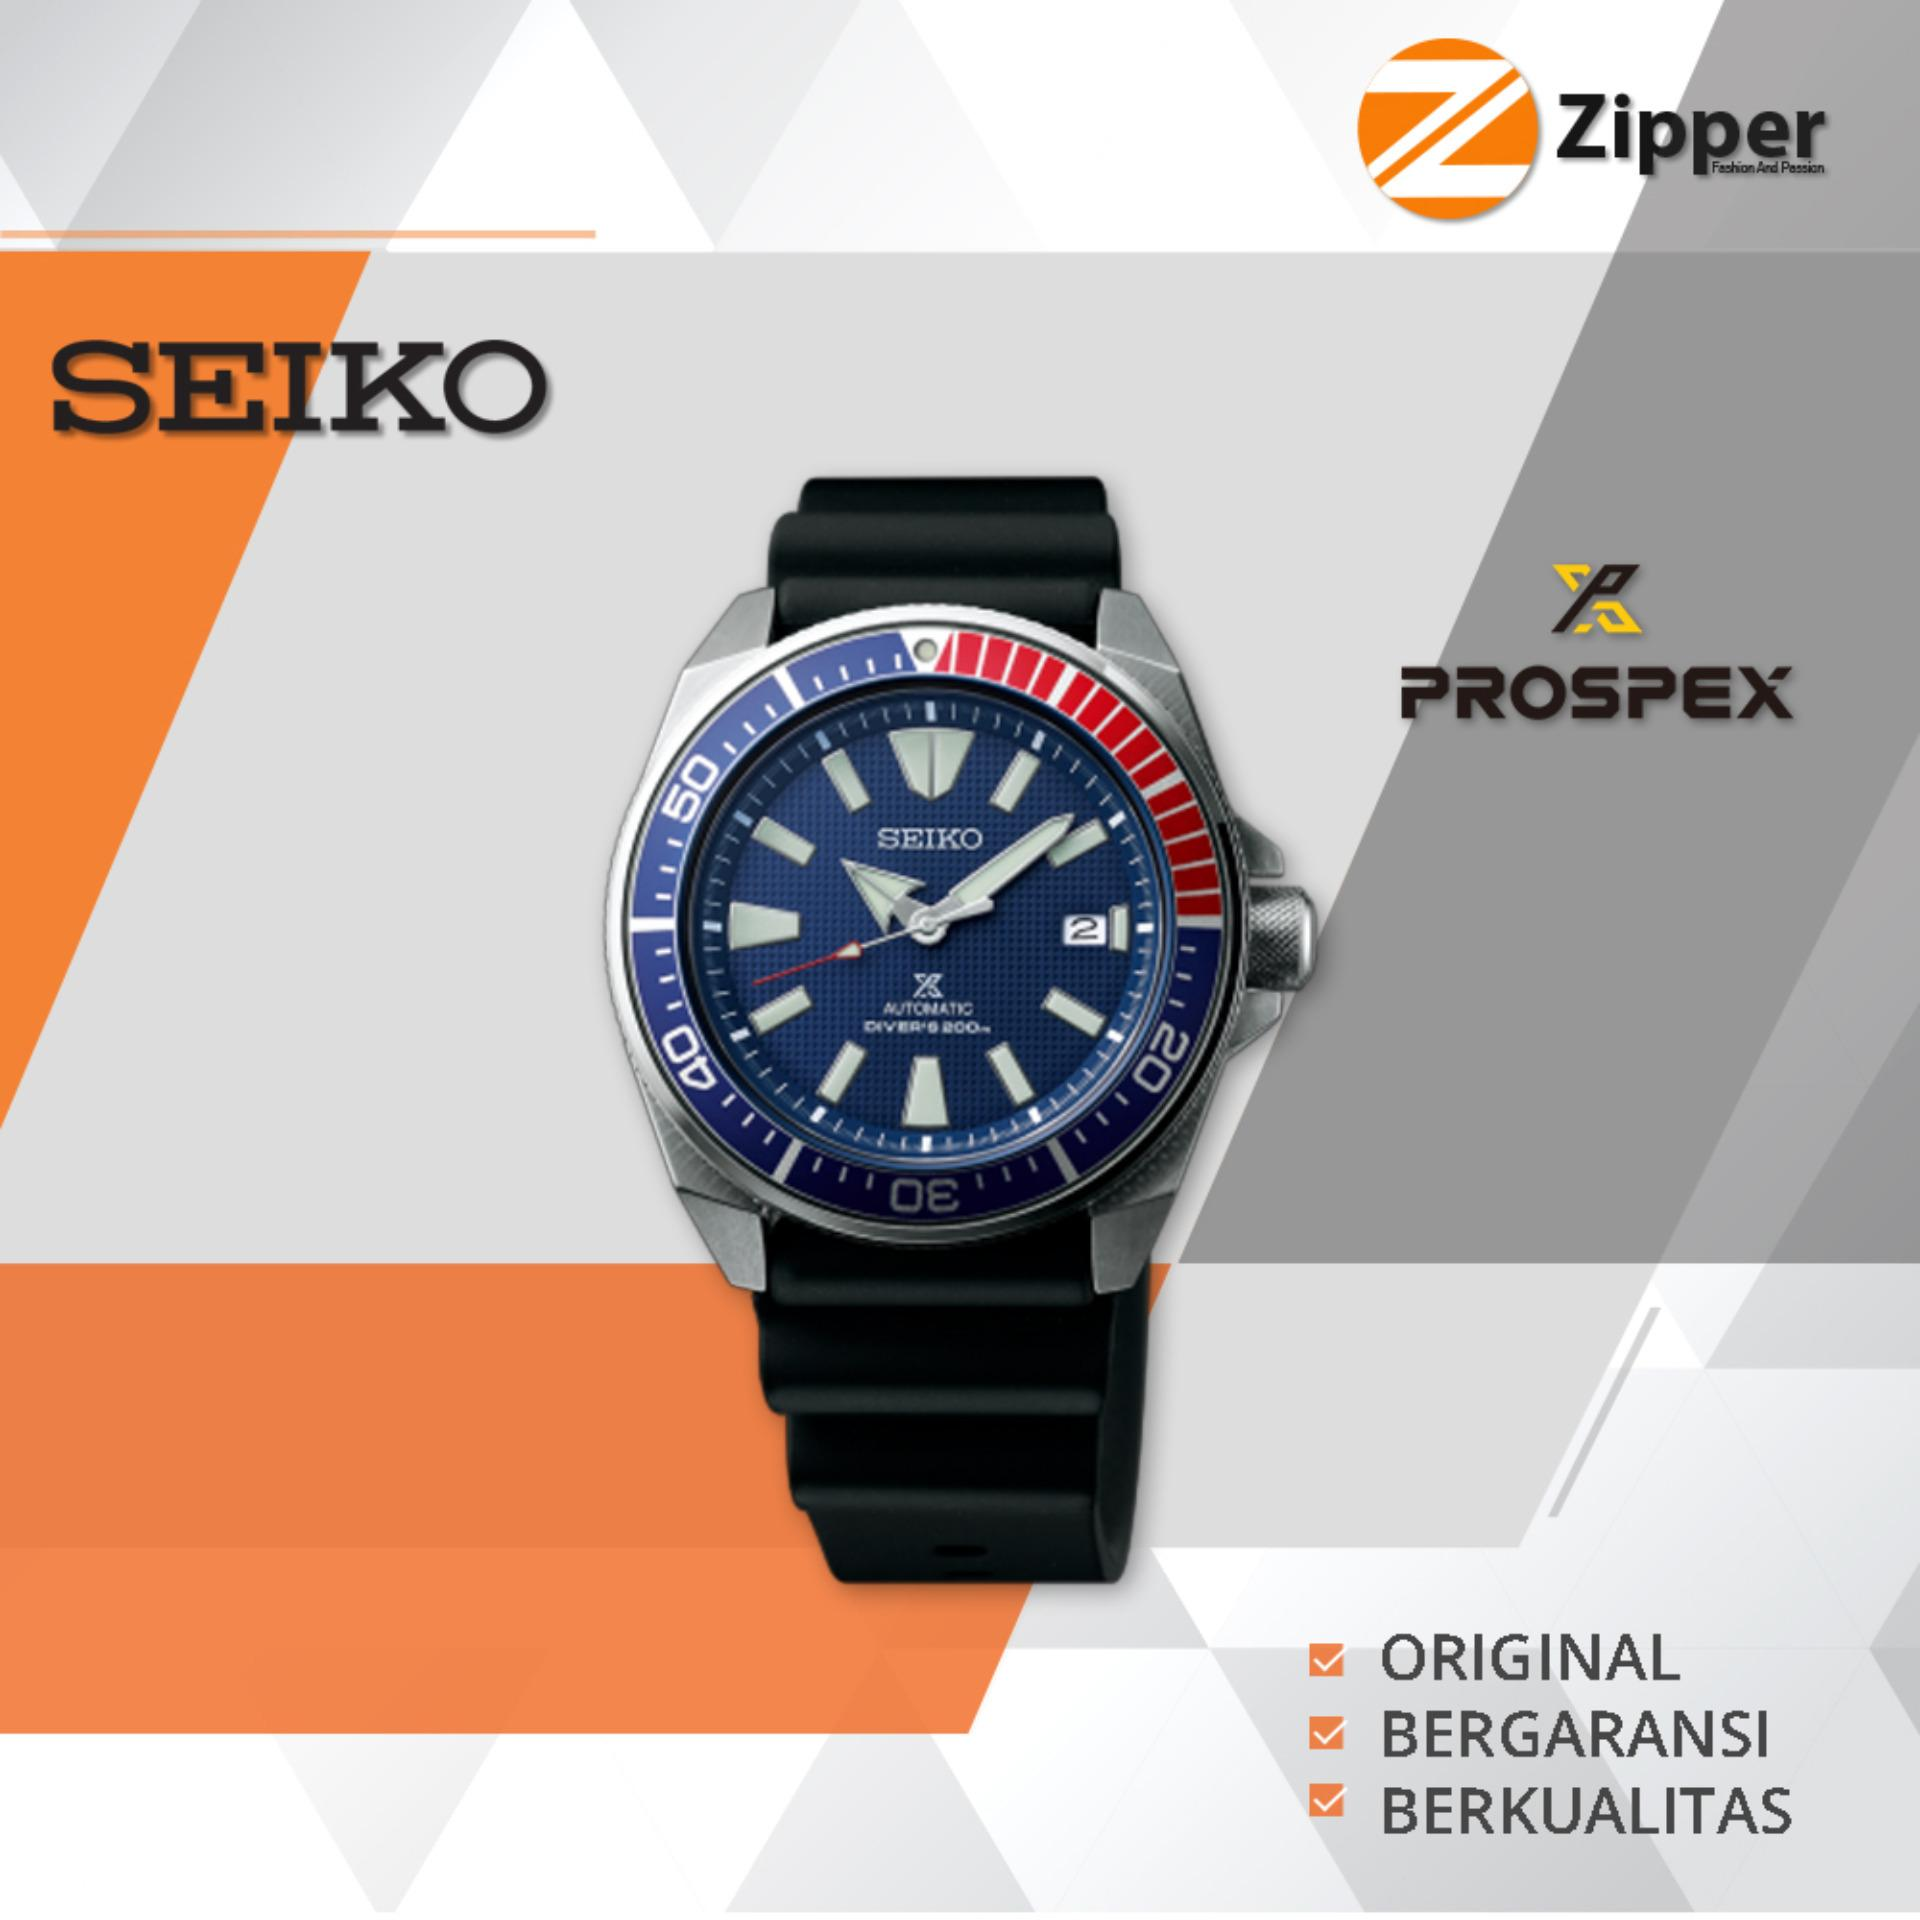 Top 10 Promo Seiko Prospex Sea Jam Tangan Pria Automatic Divers 200M Srpb Series Online